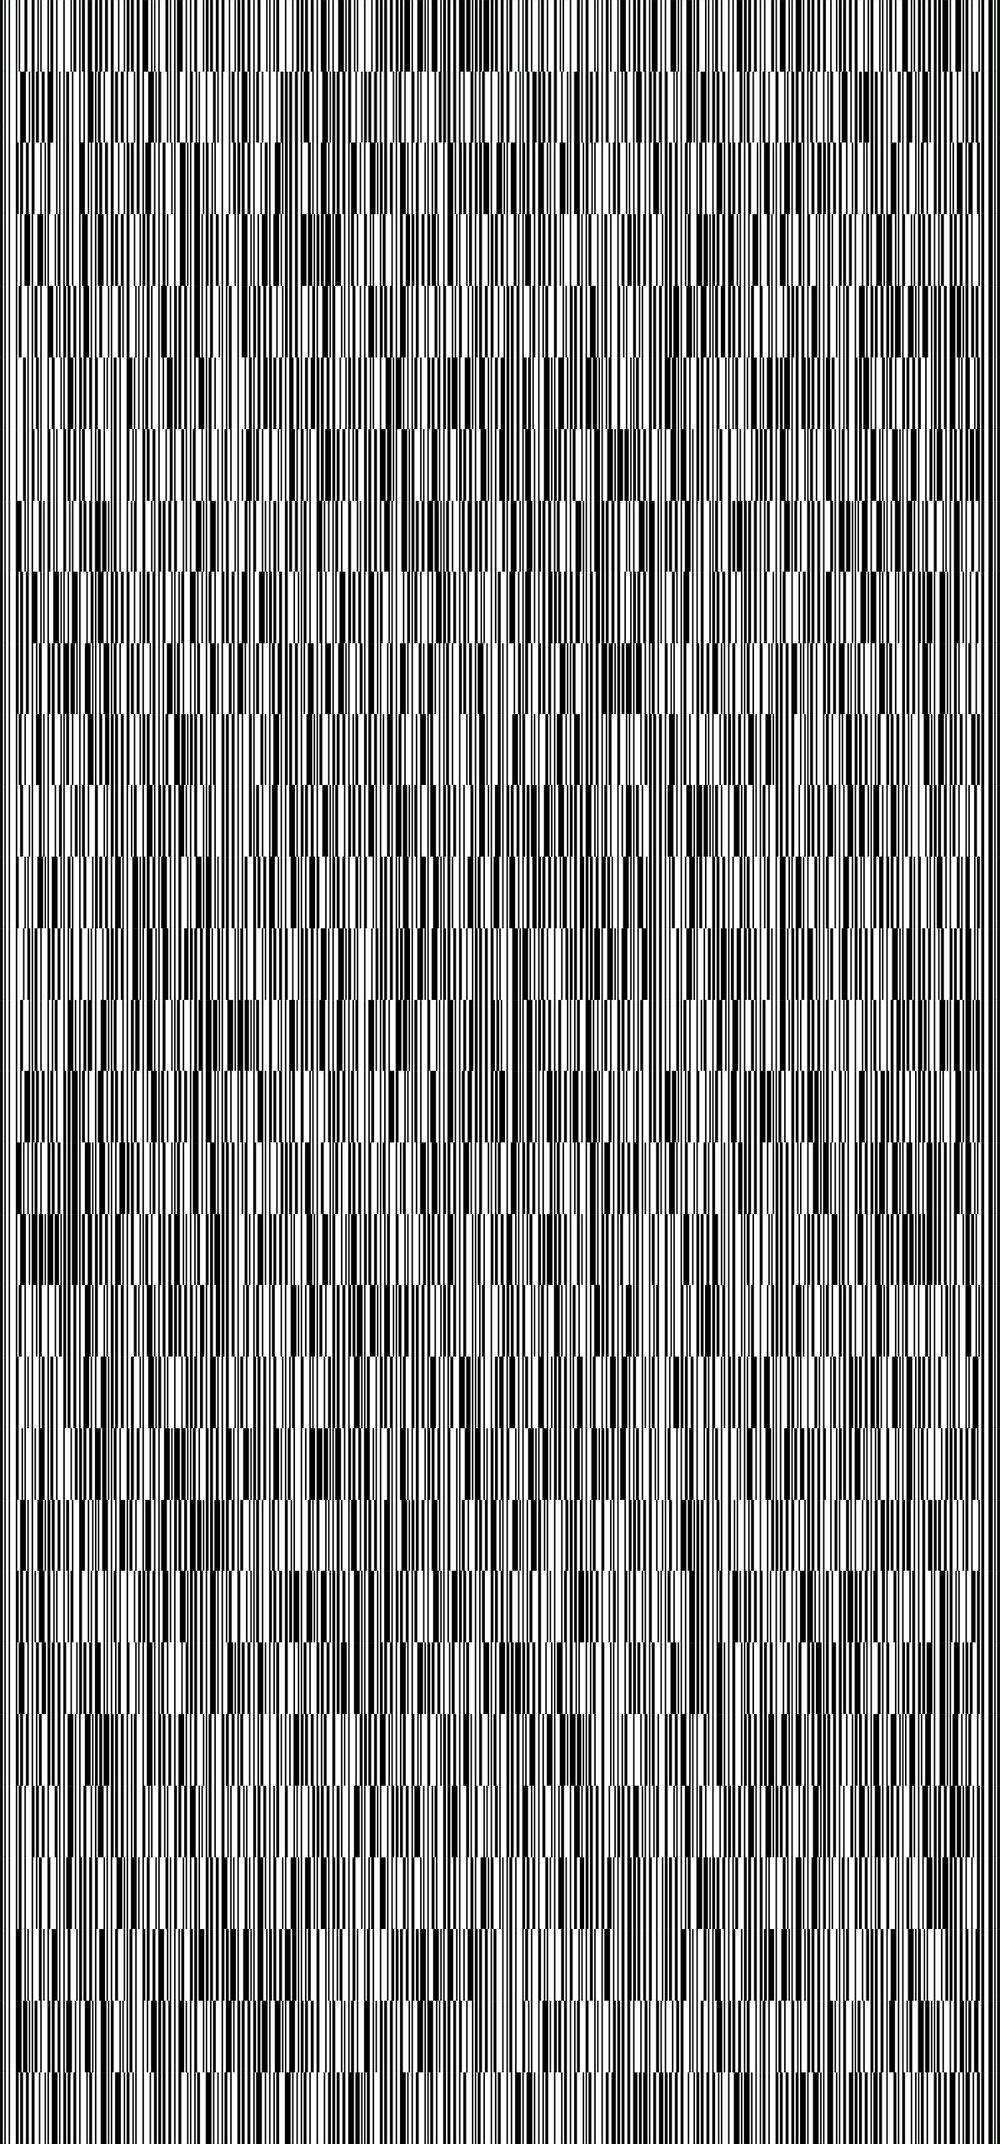 alec barcode 128.jpg